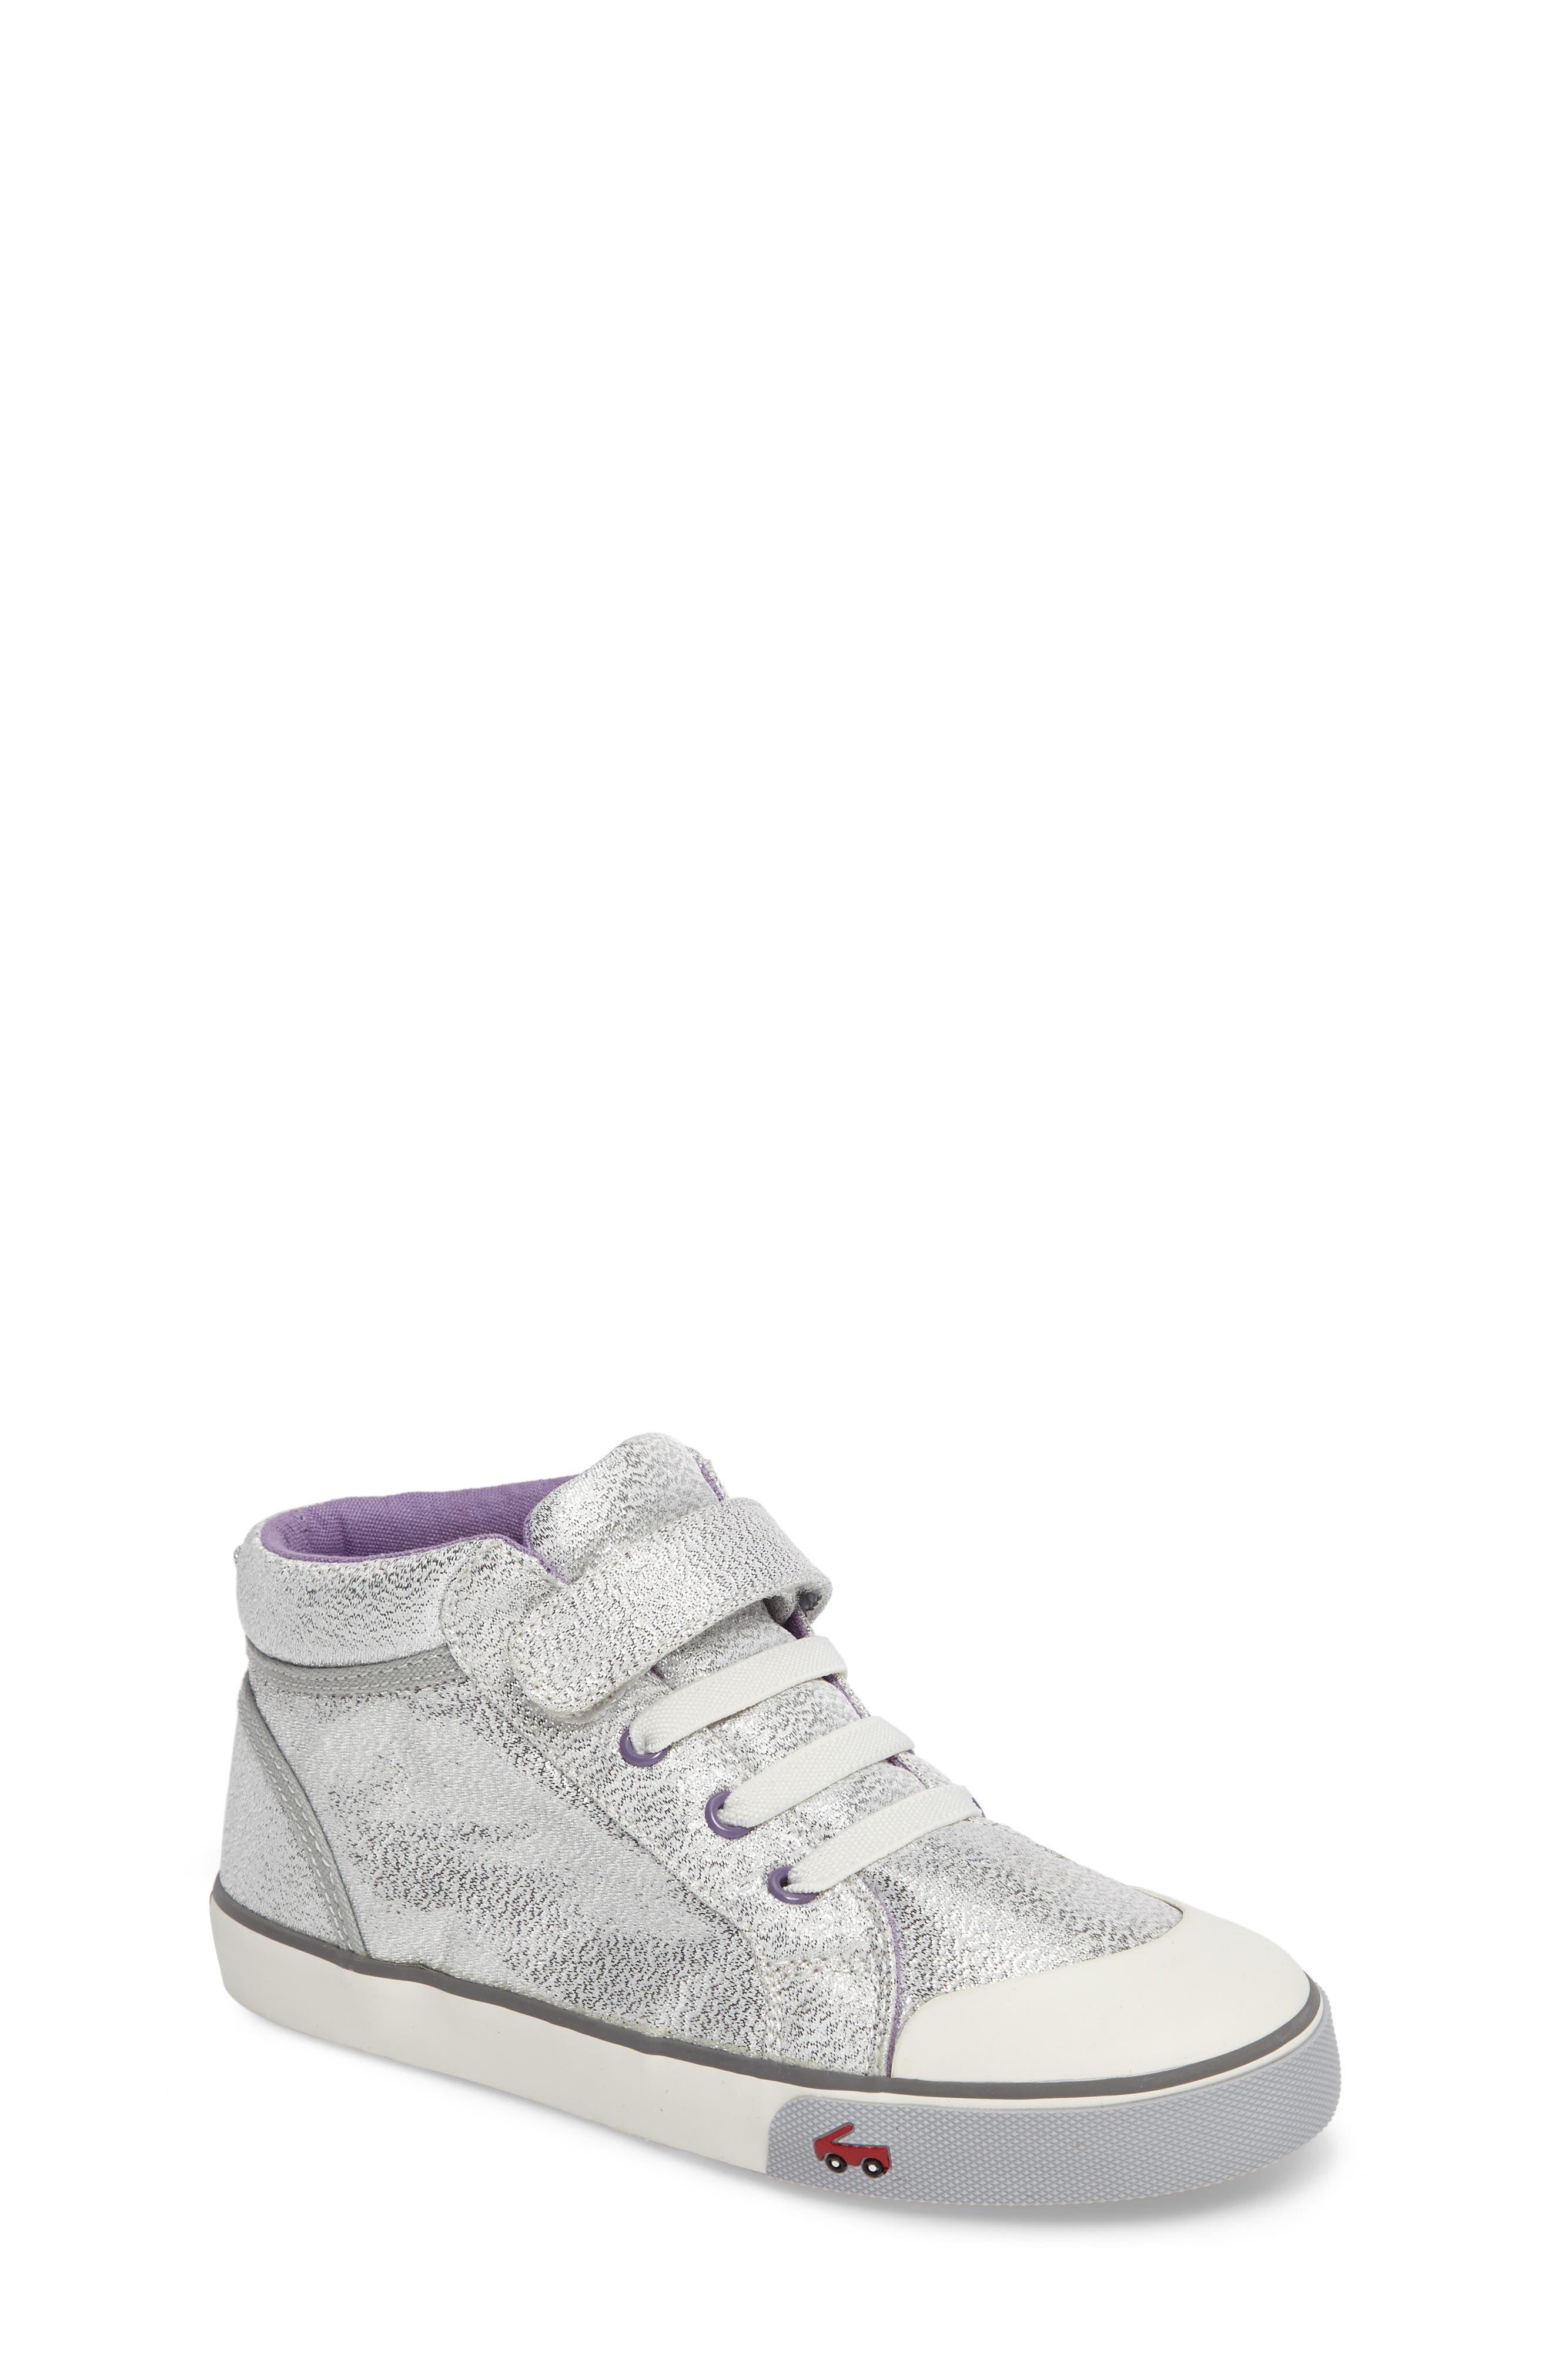 Peyton Metallic Mid Top Sneaker,                         Main,                         color, Silver